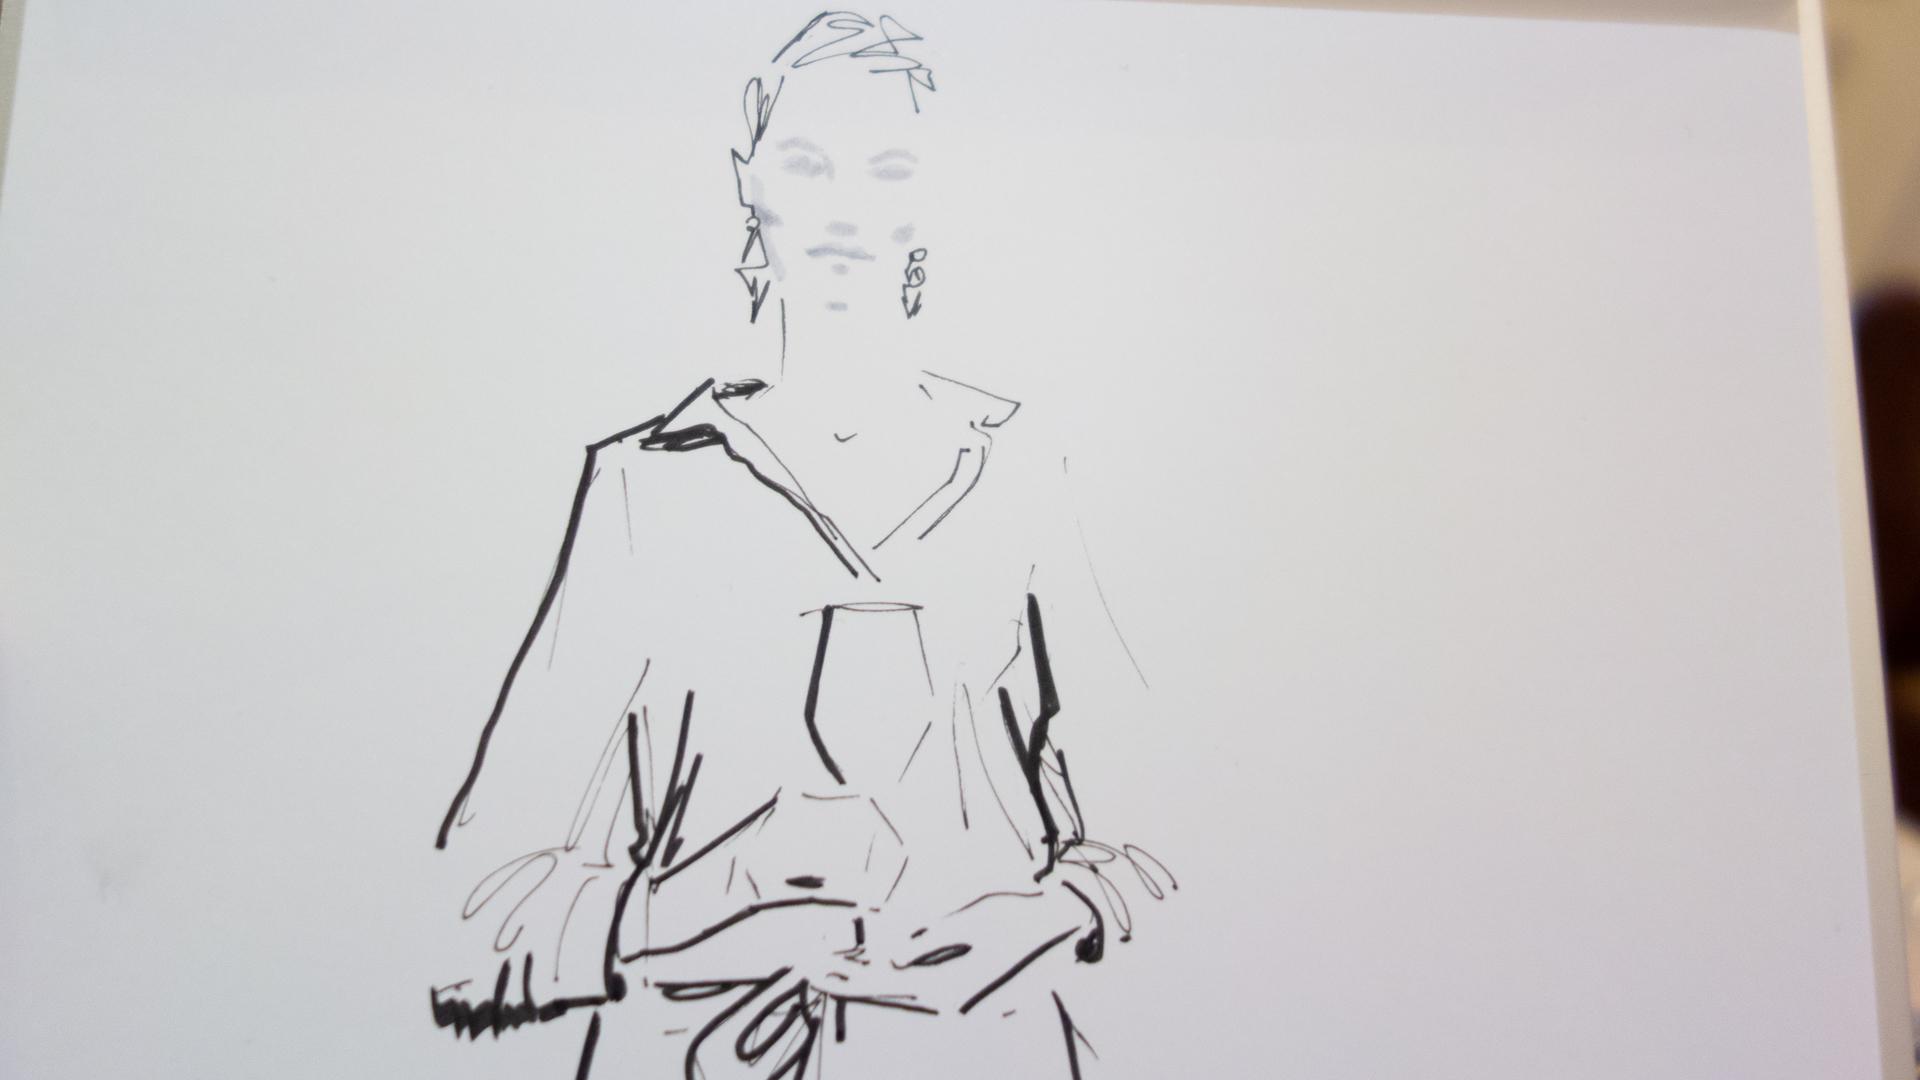 Live-Sketching-Fashion-Illustration-Event-Lillet-Virginia-Romo-1.jpg